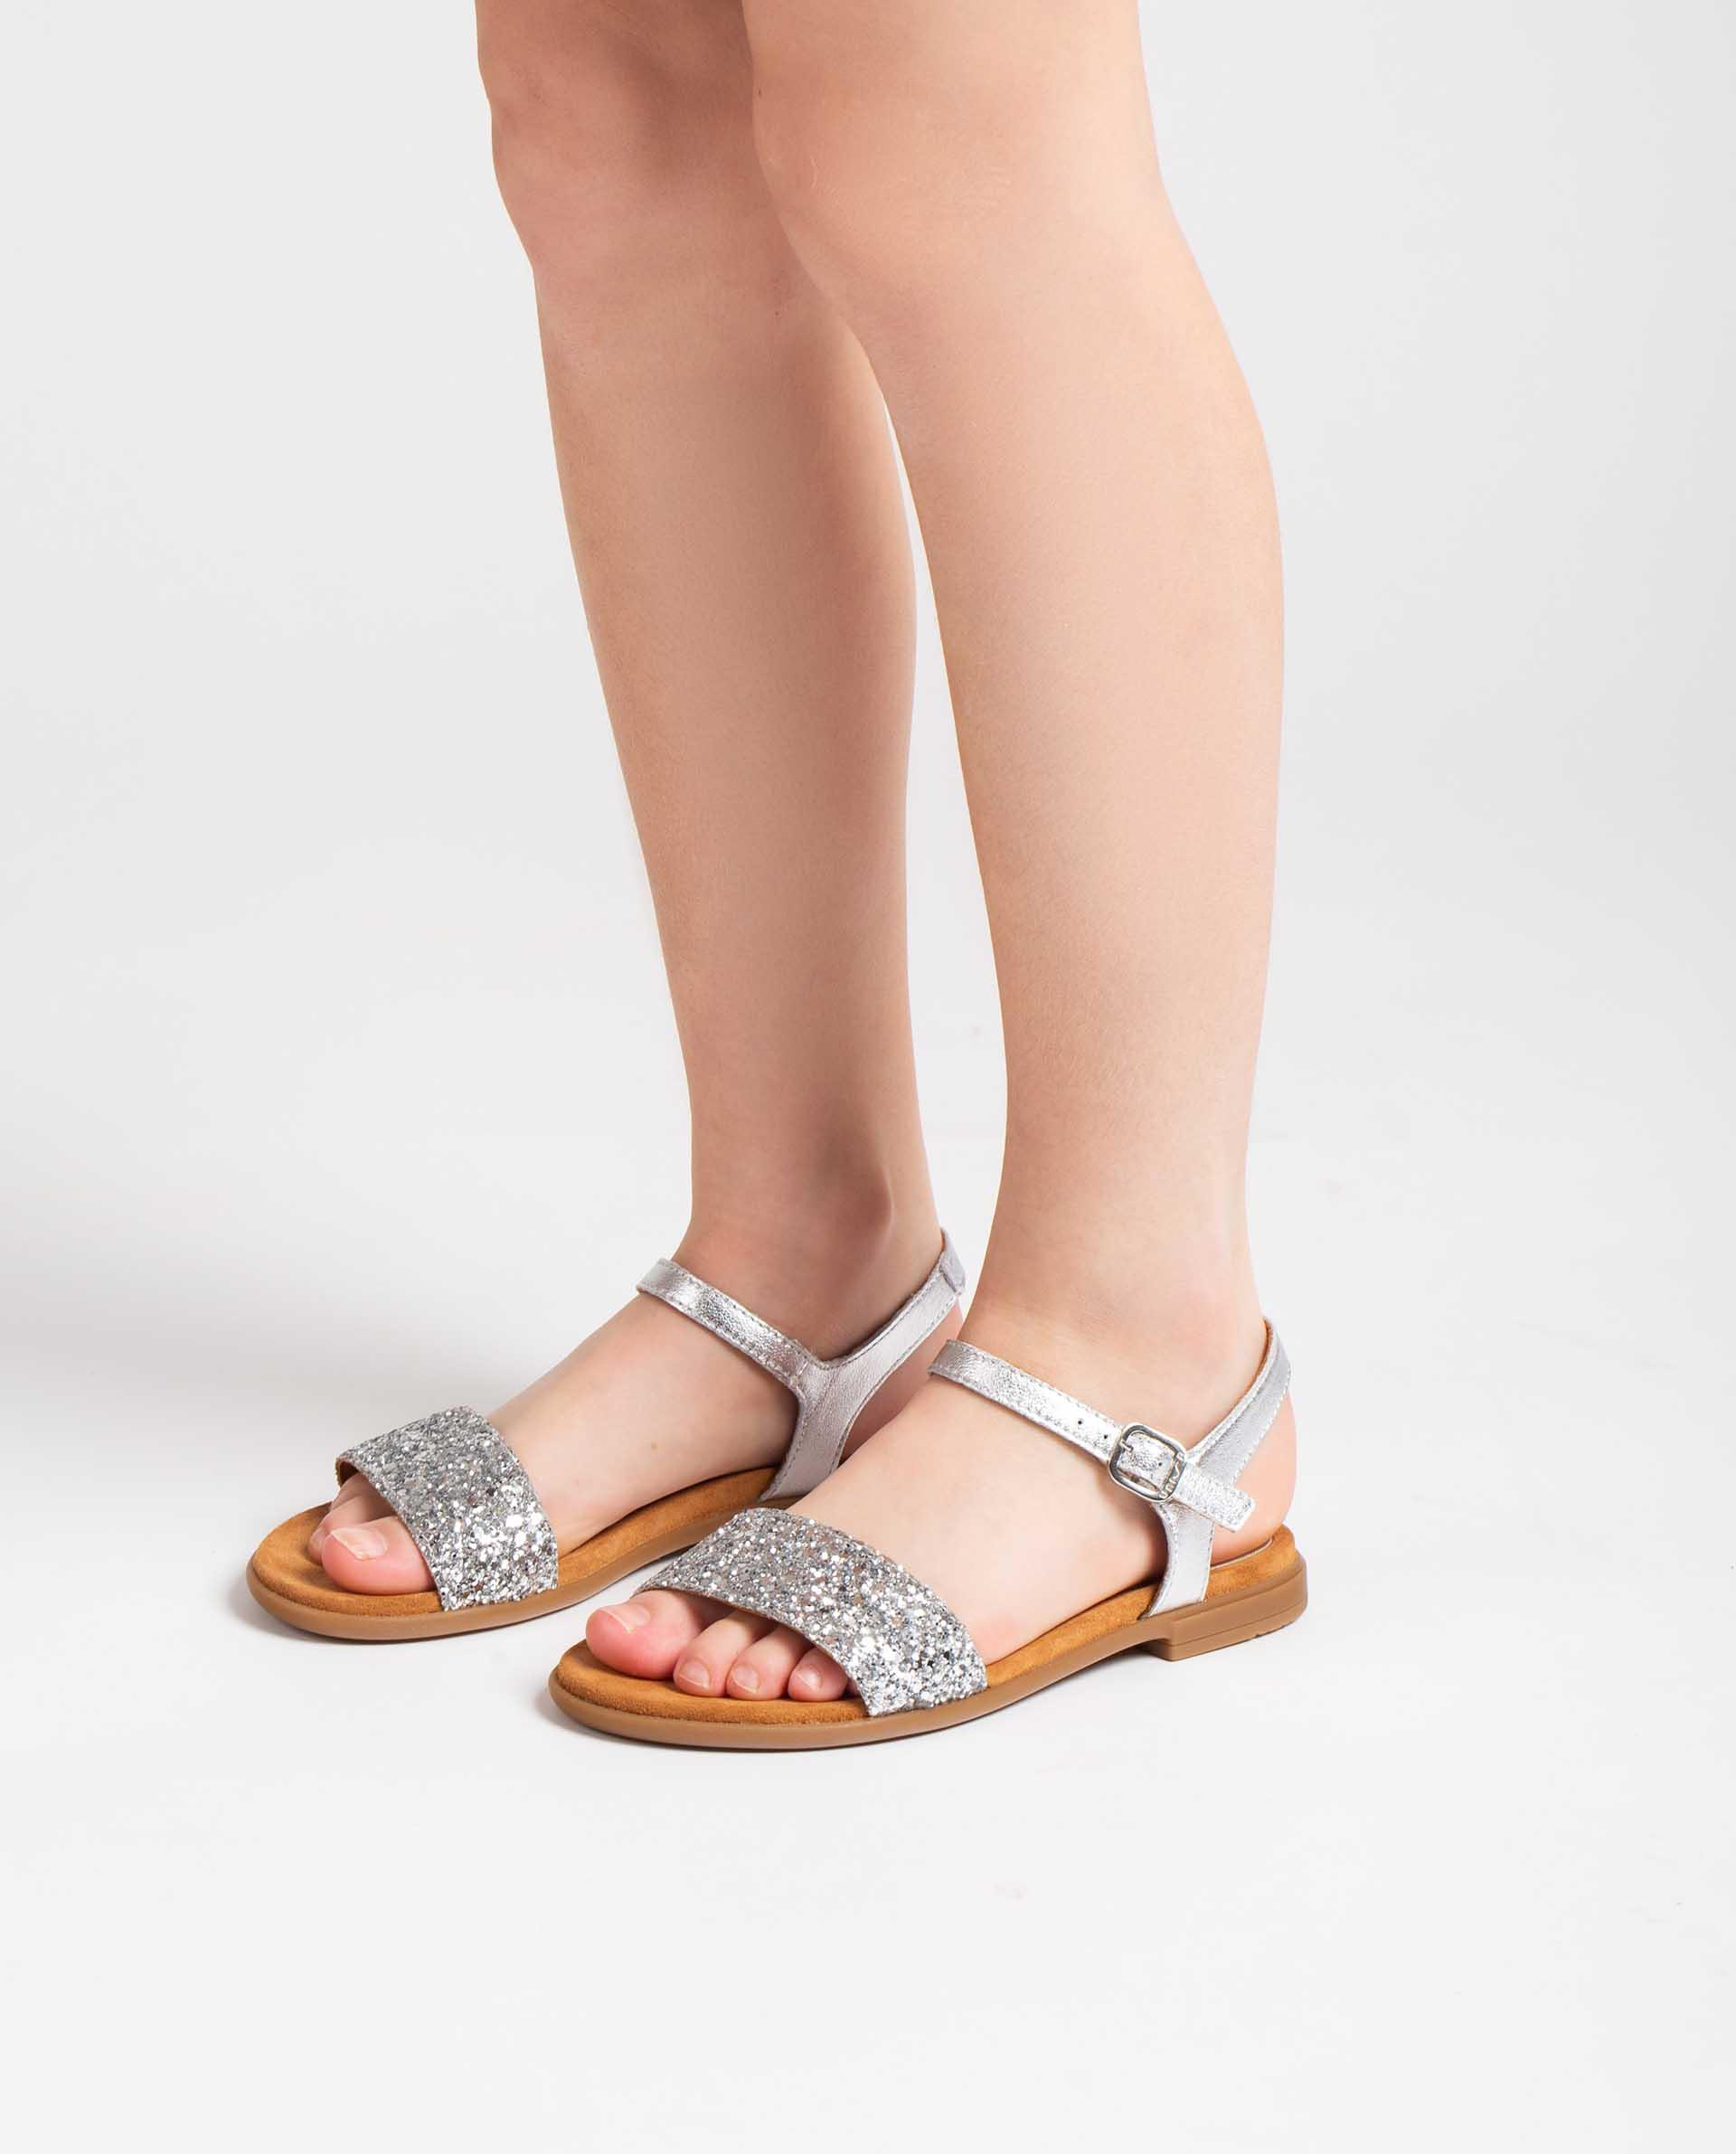 Unisa Sandals LIRITA_21_LMT_GL_CAN silver